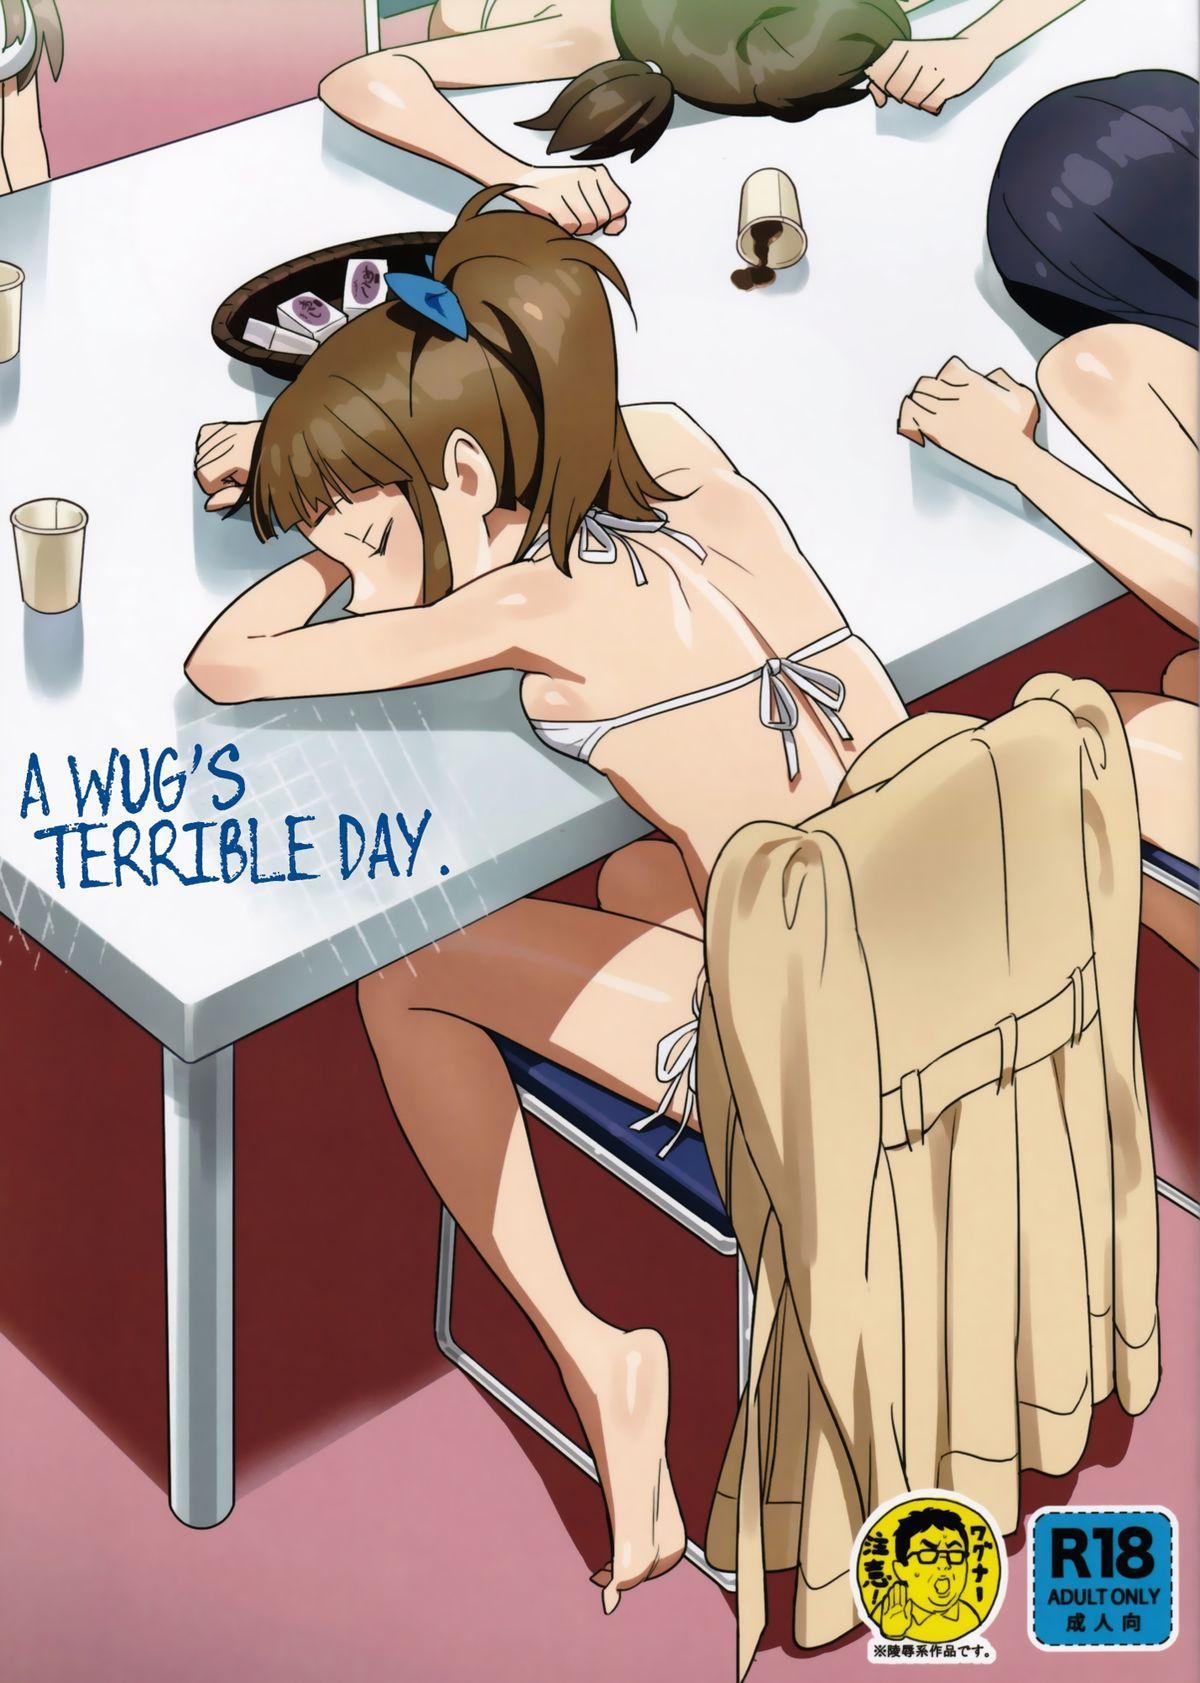 WUG no Hidoi Hi. | WUG's Terrible Day. 0